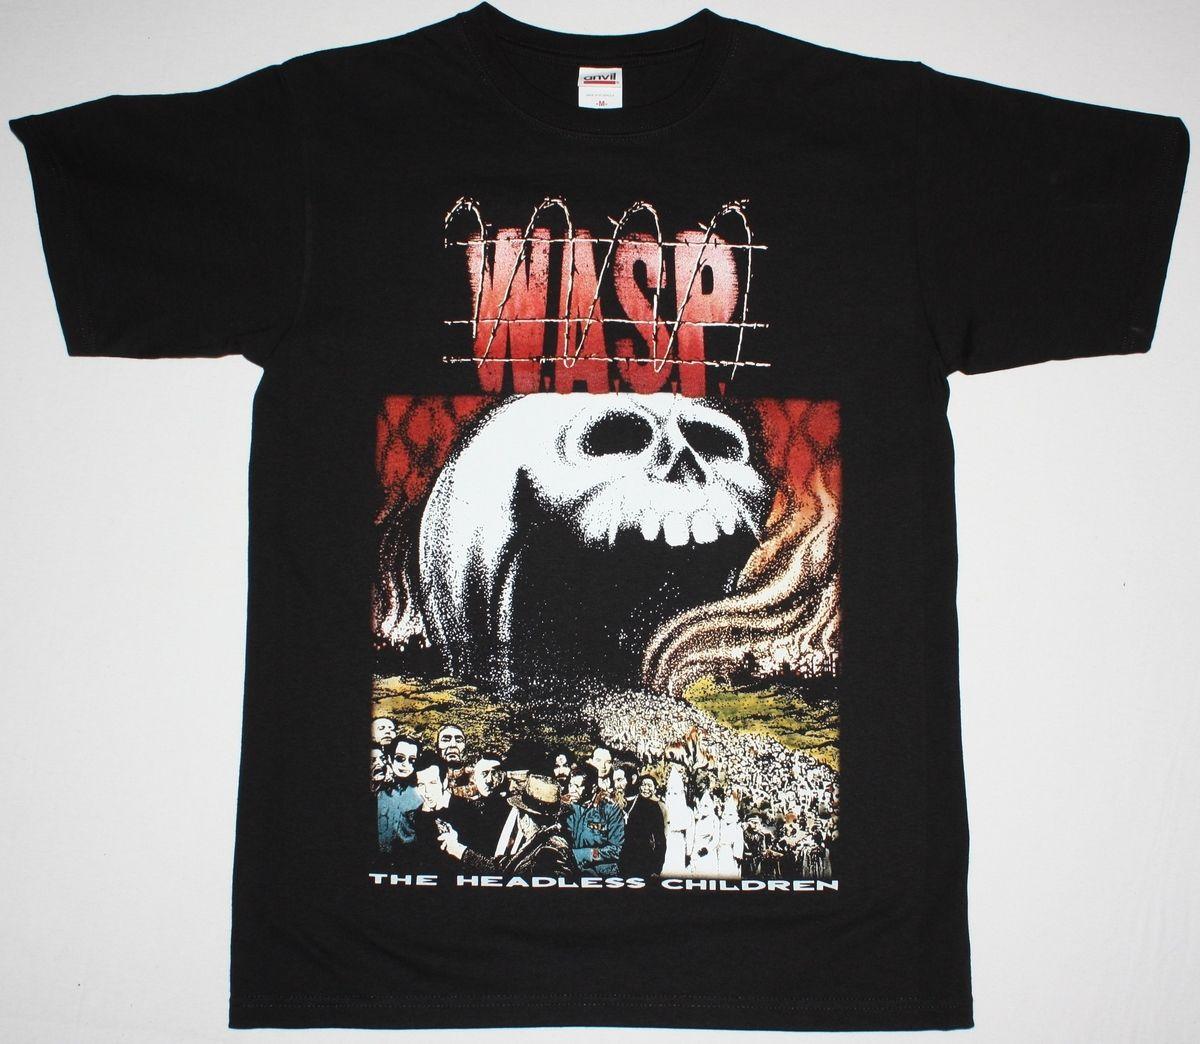 W.A.S.P. THE HEADLESS CHILDREN89 WASP HEAVY METAL BAND RATT NEW BLACK T-SHIRT T Shirt Summer Tops Tees